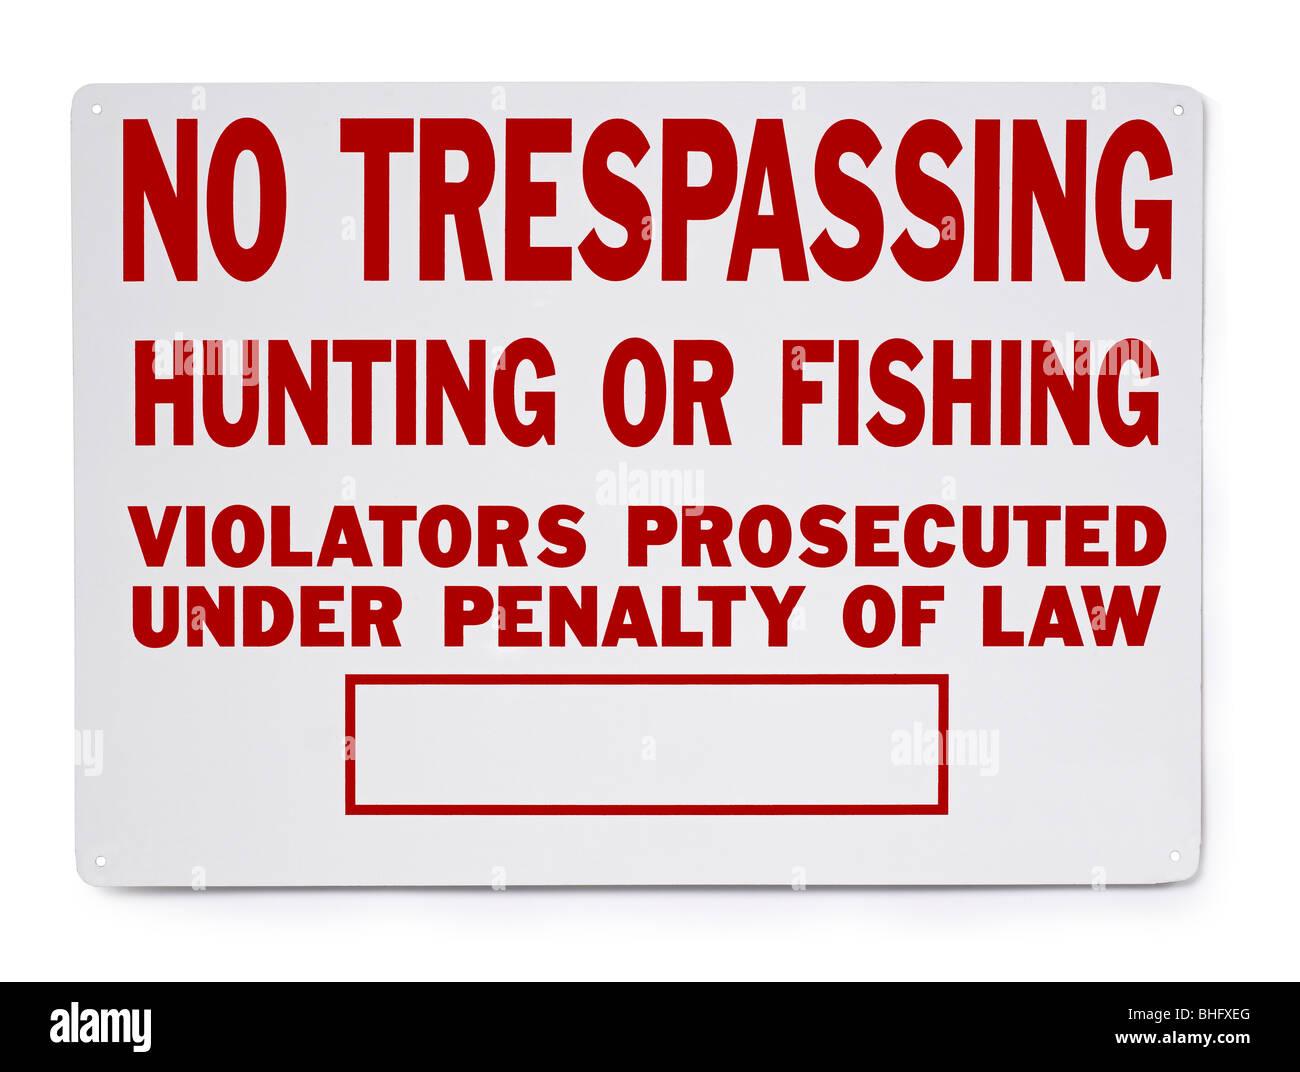 No Trespassing Hunting Fishing Sign - Stock Image